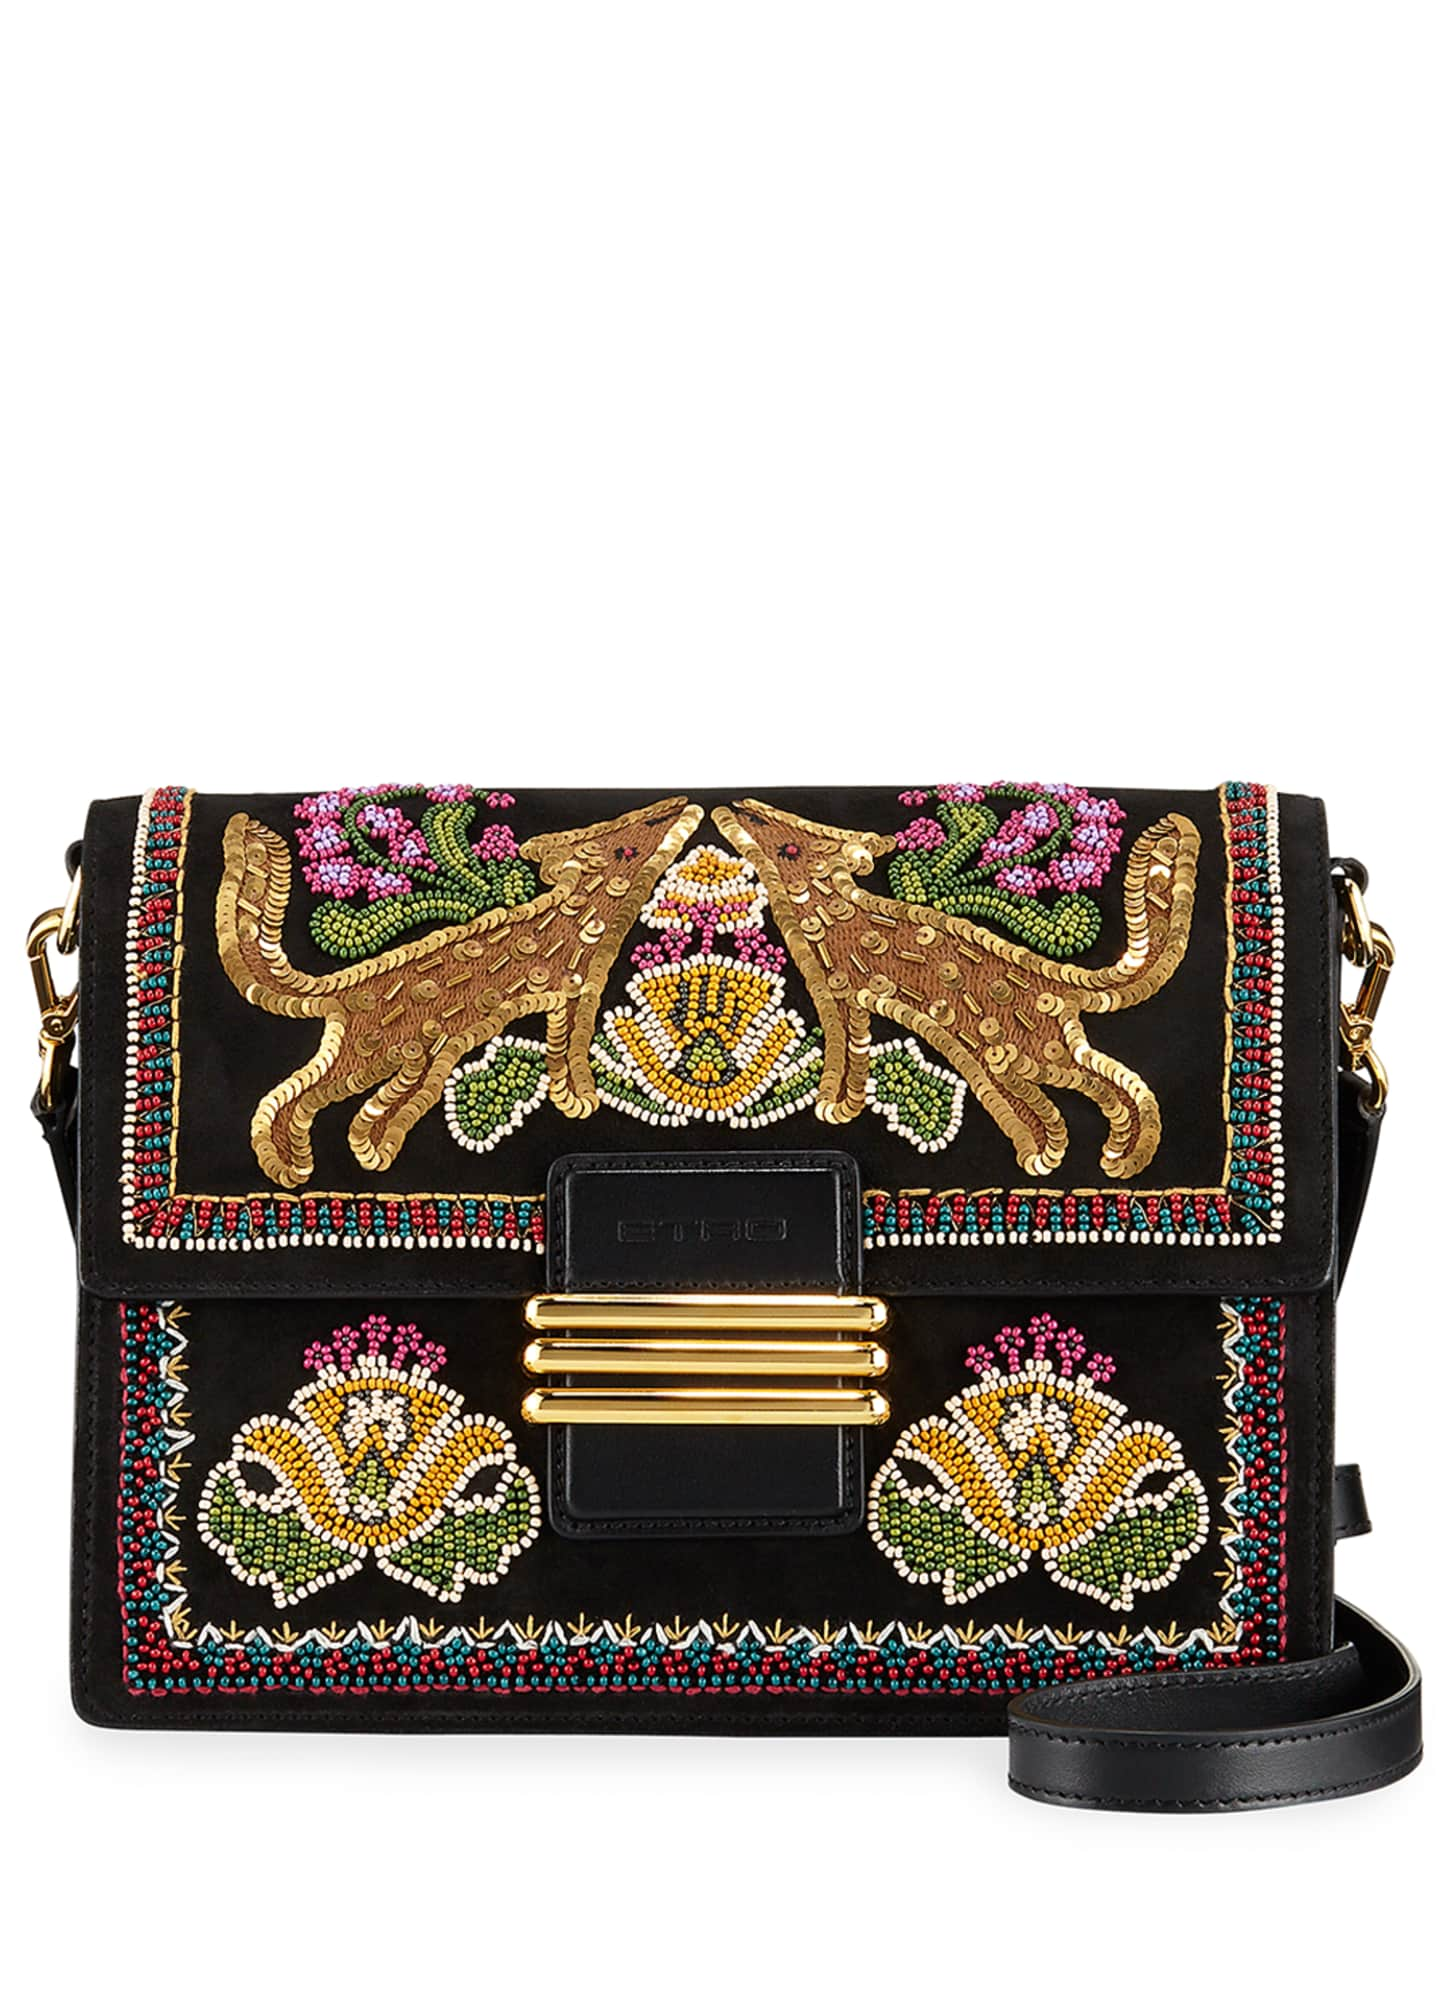 Etro Forrest Embroidered Suede Rainbow Shoulder Bag